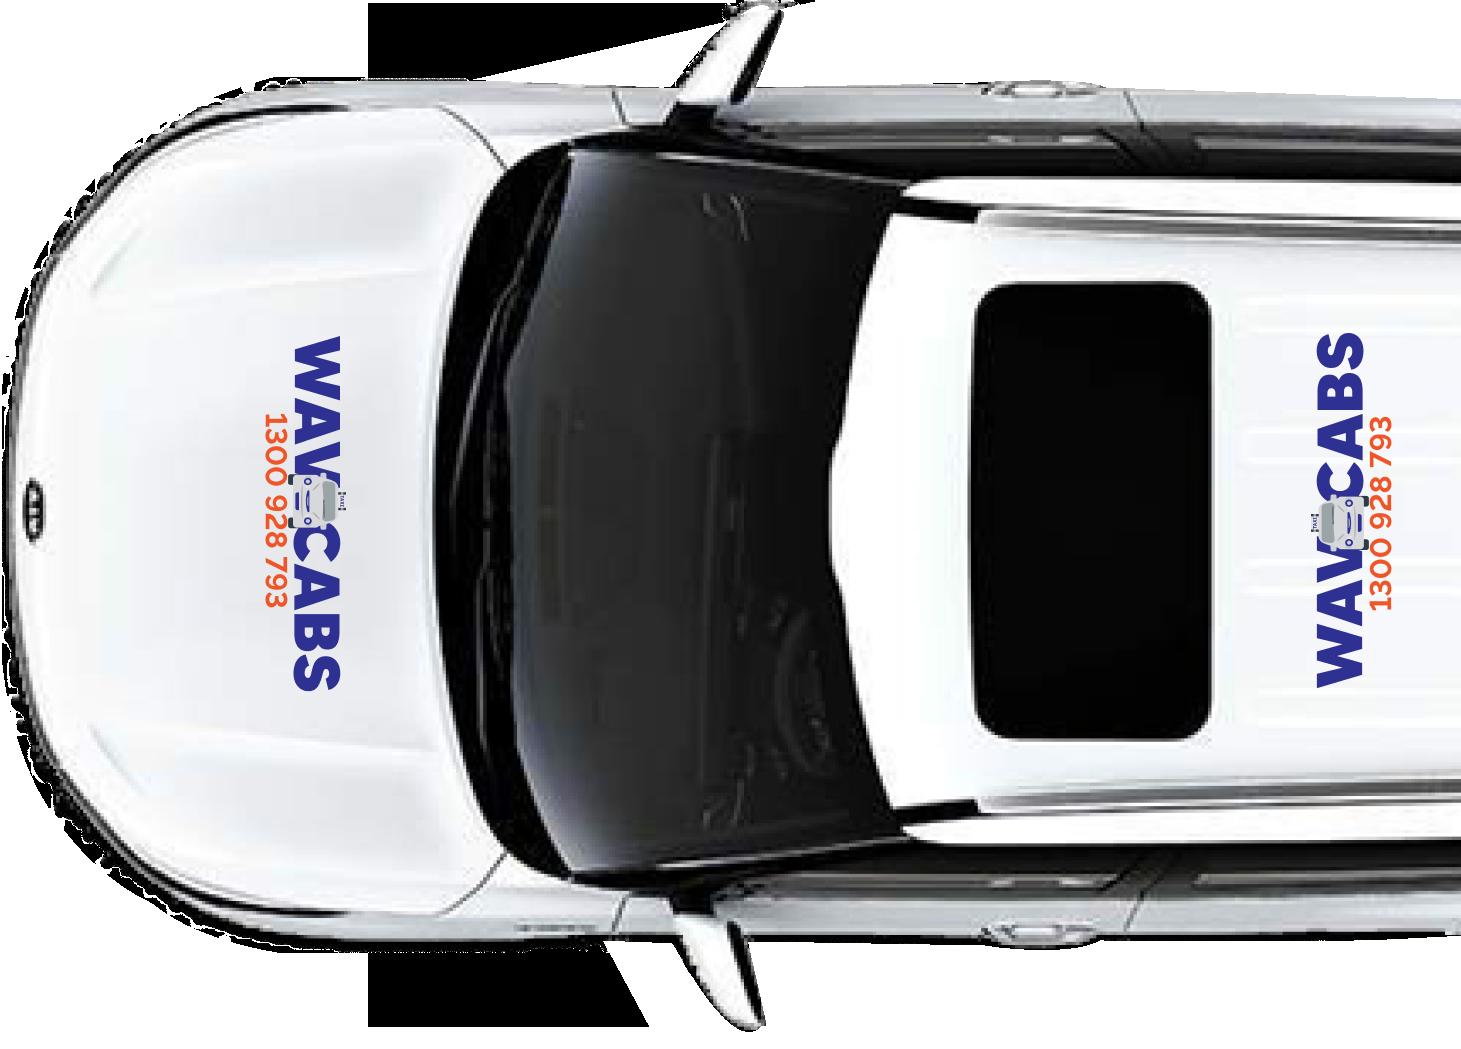 maxi cab sydney